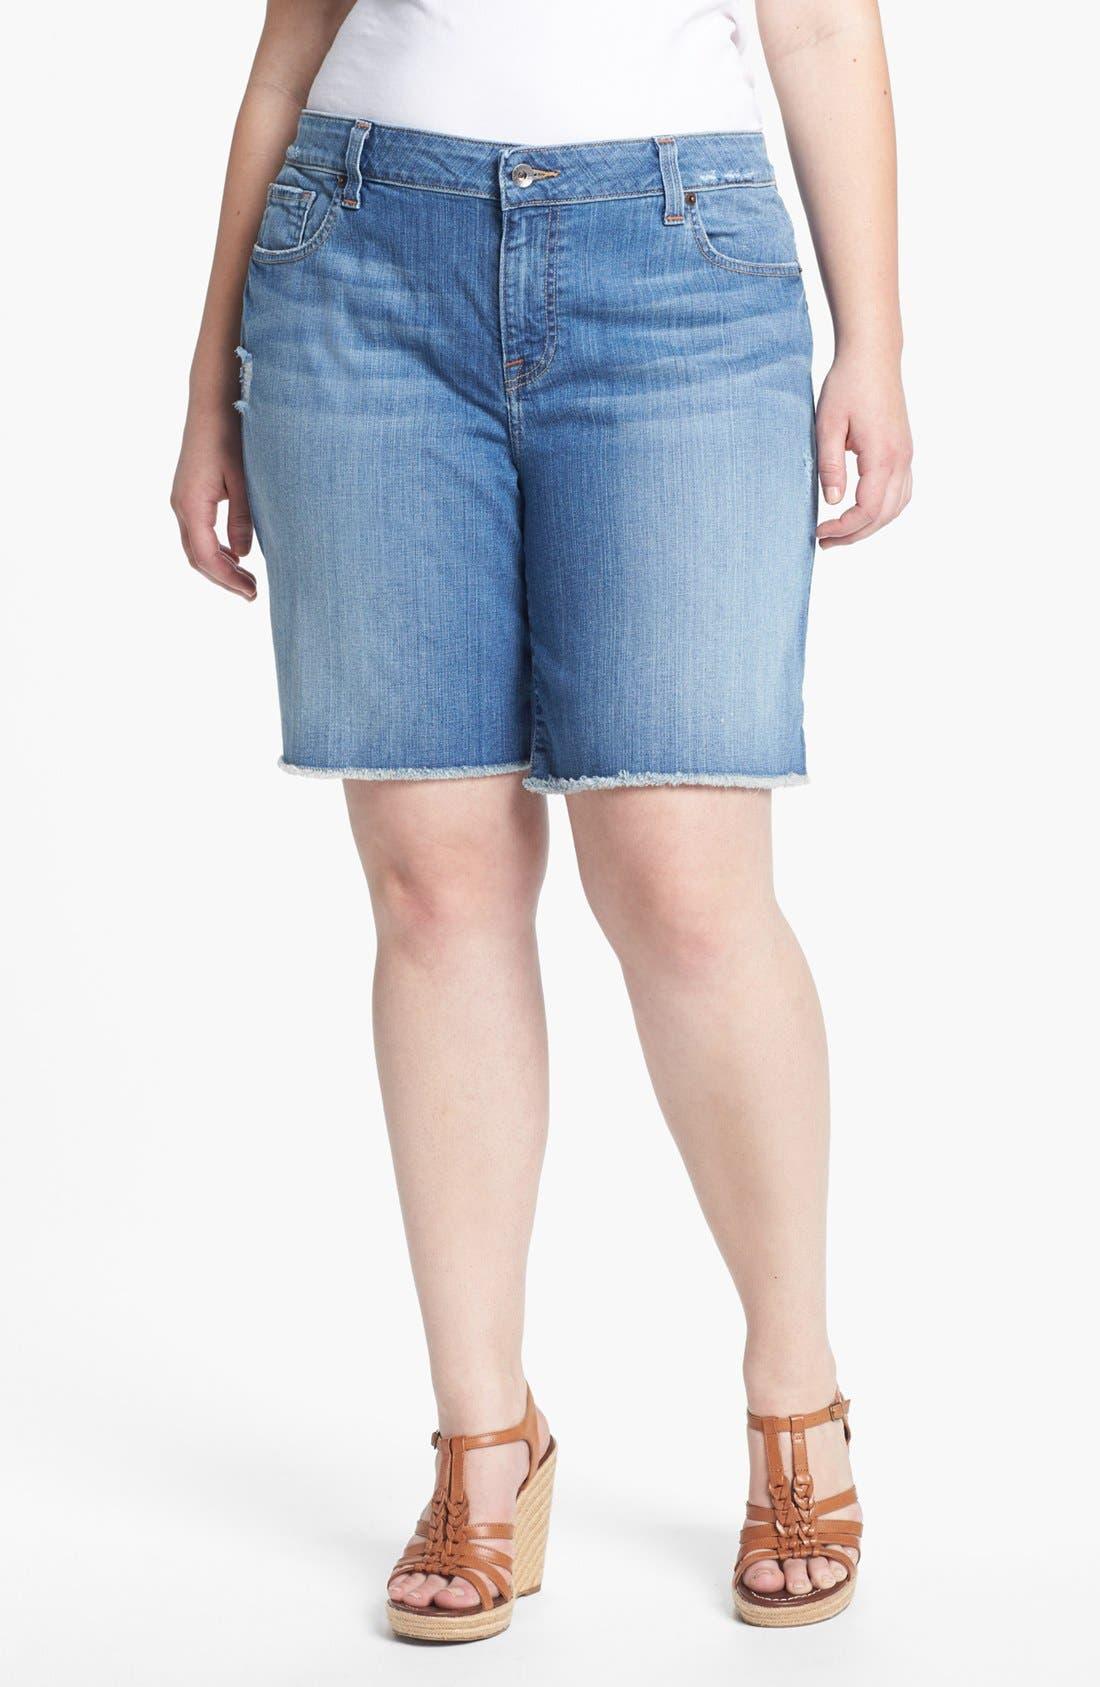 Alternate Image 1 Selected - Lucky Brand 'Ginger' Frayed Denim Shorts (Plus Size)